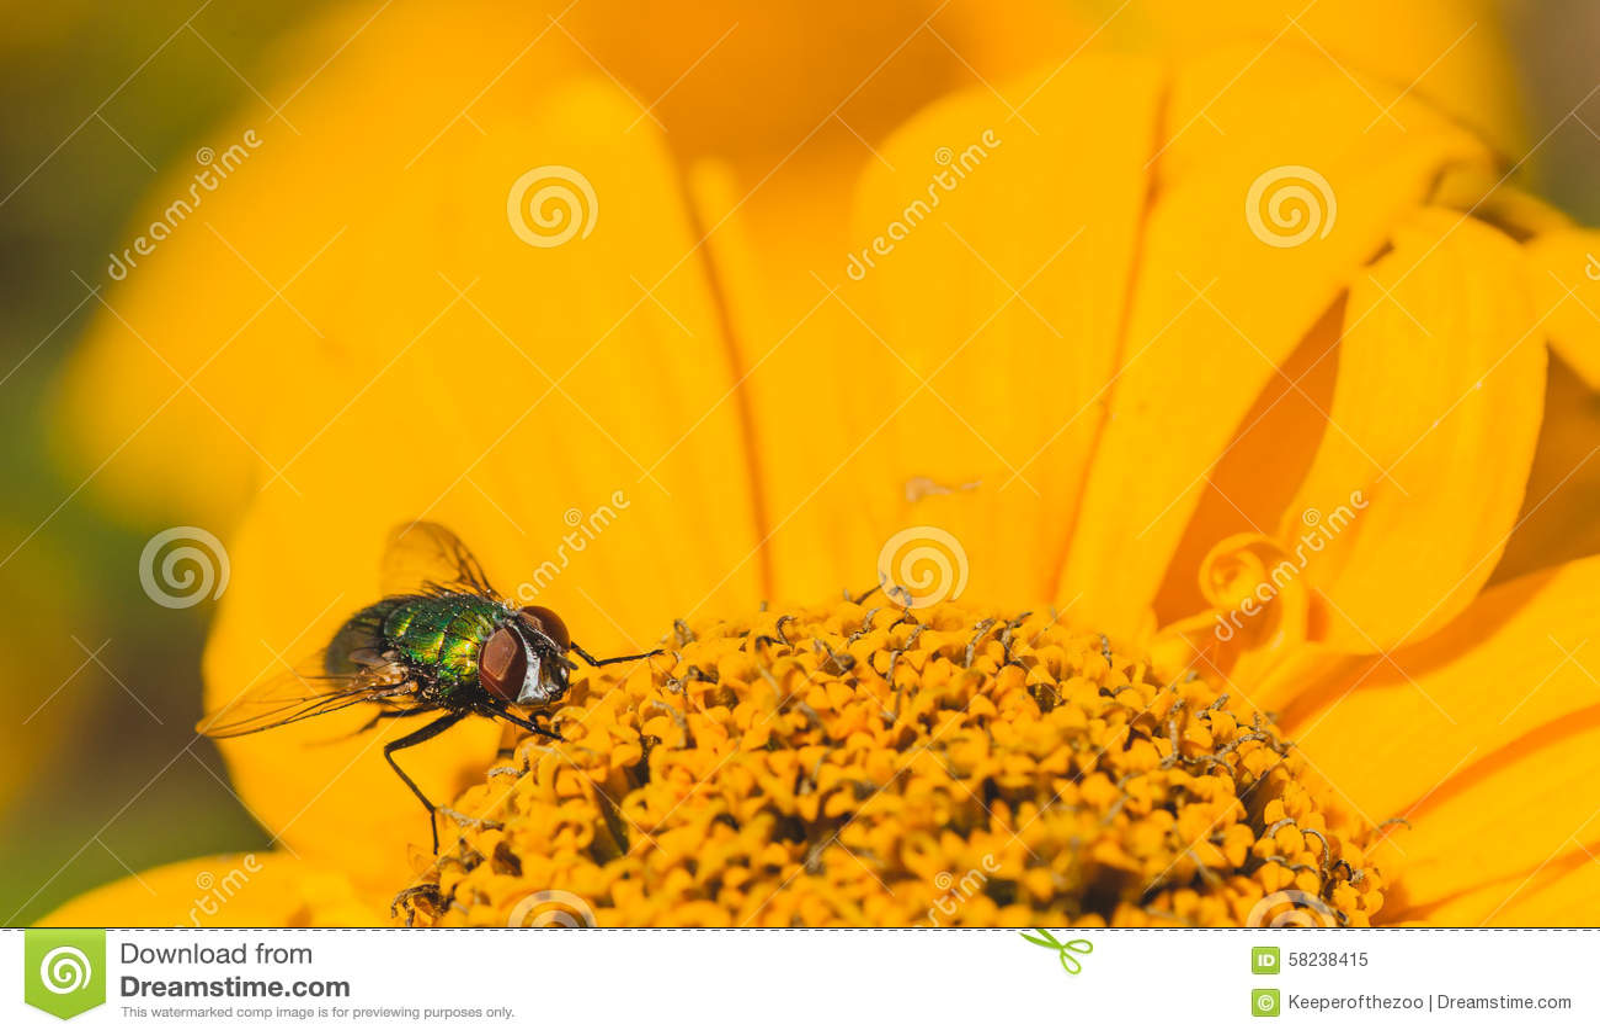 Green Bottle Fly on a Chrysanthemum